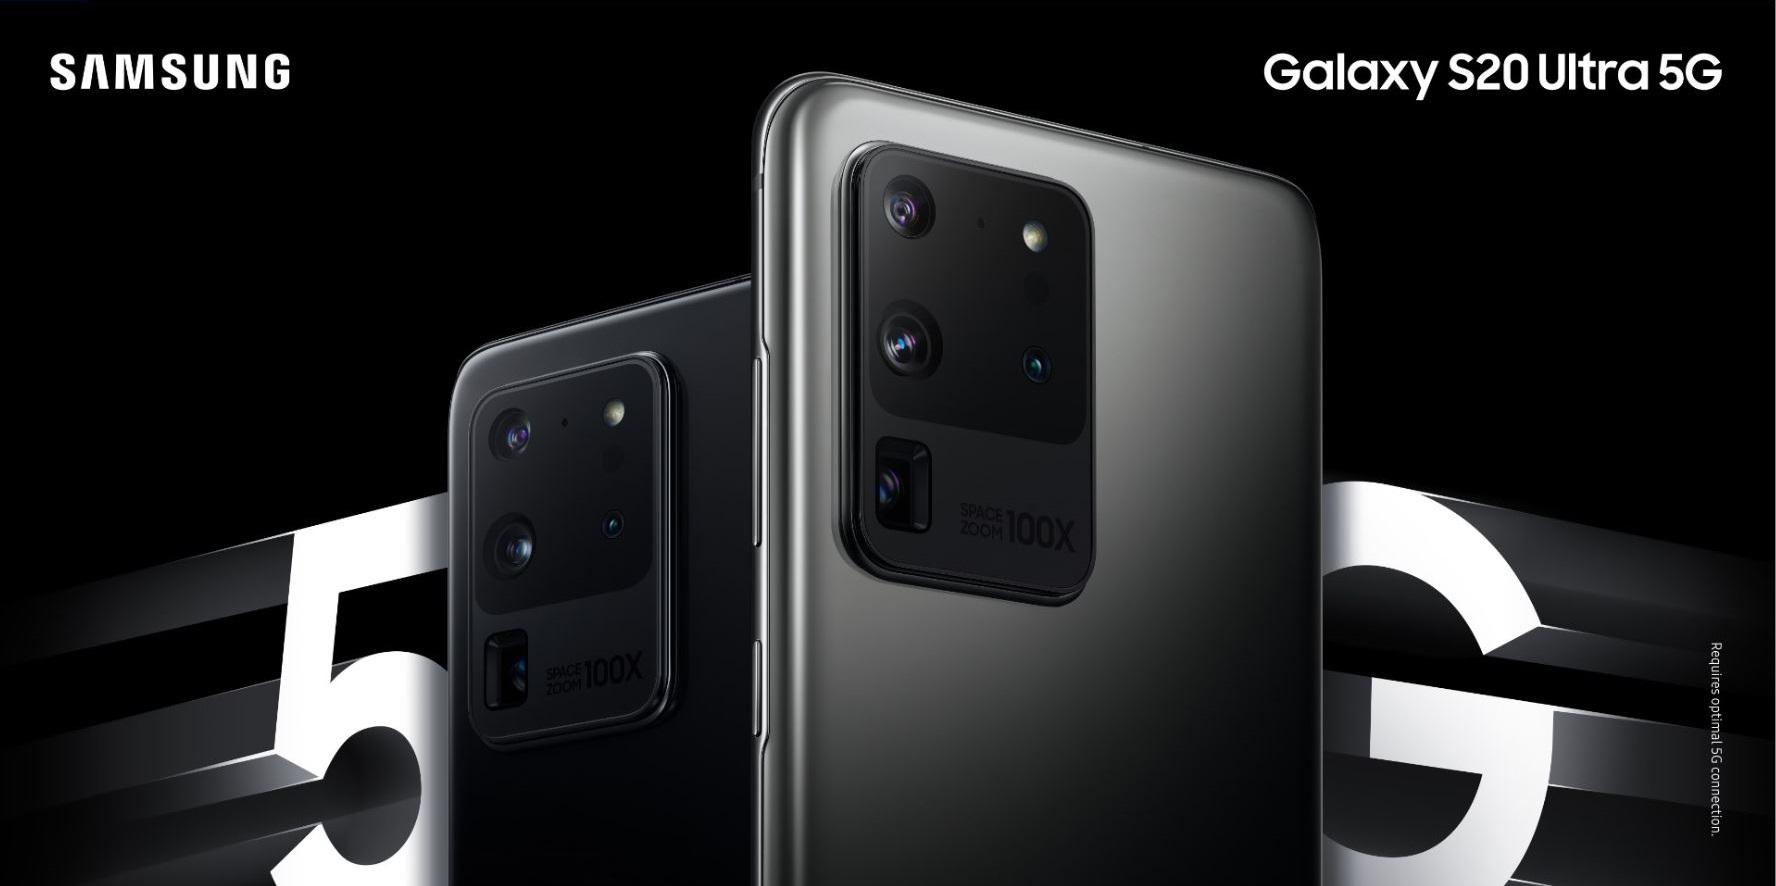 2】Galaxy S20 Ultra 5G即日起釋出軟體更新,發揮強大潛能